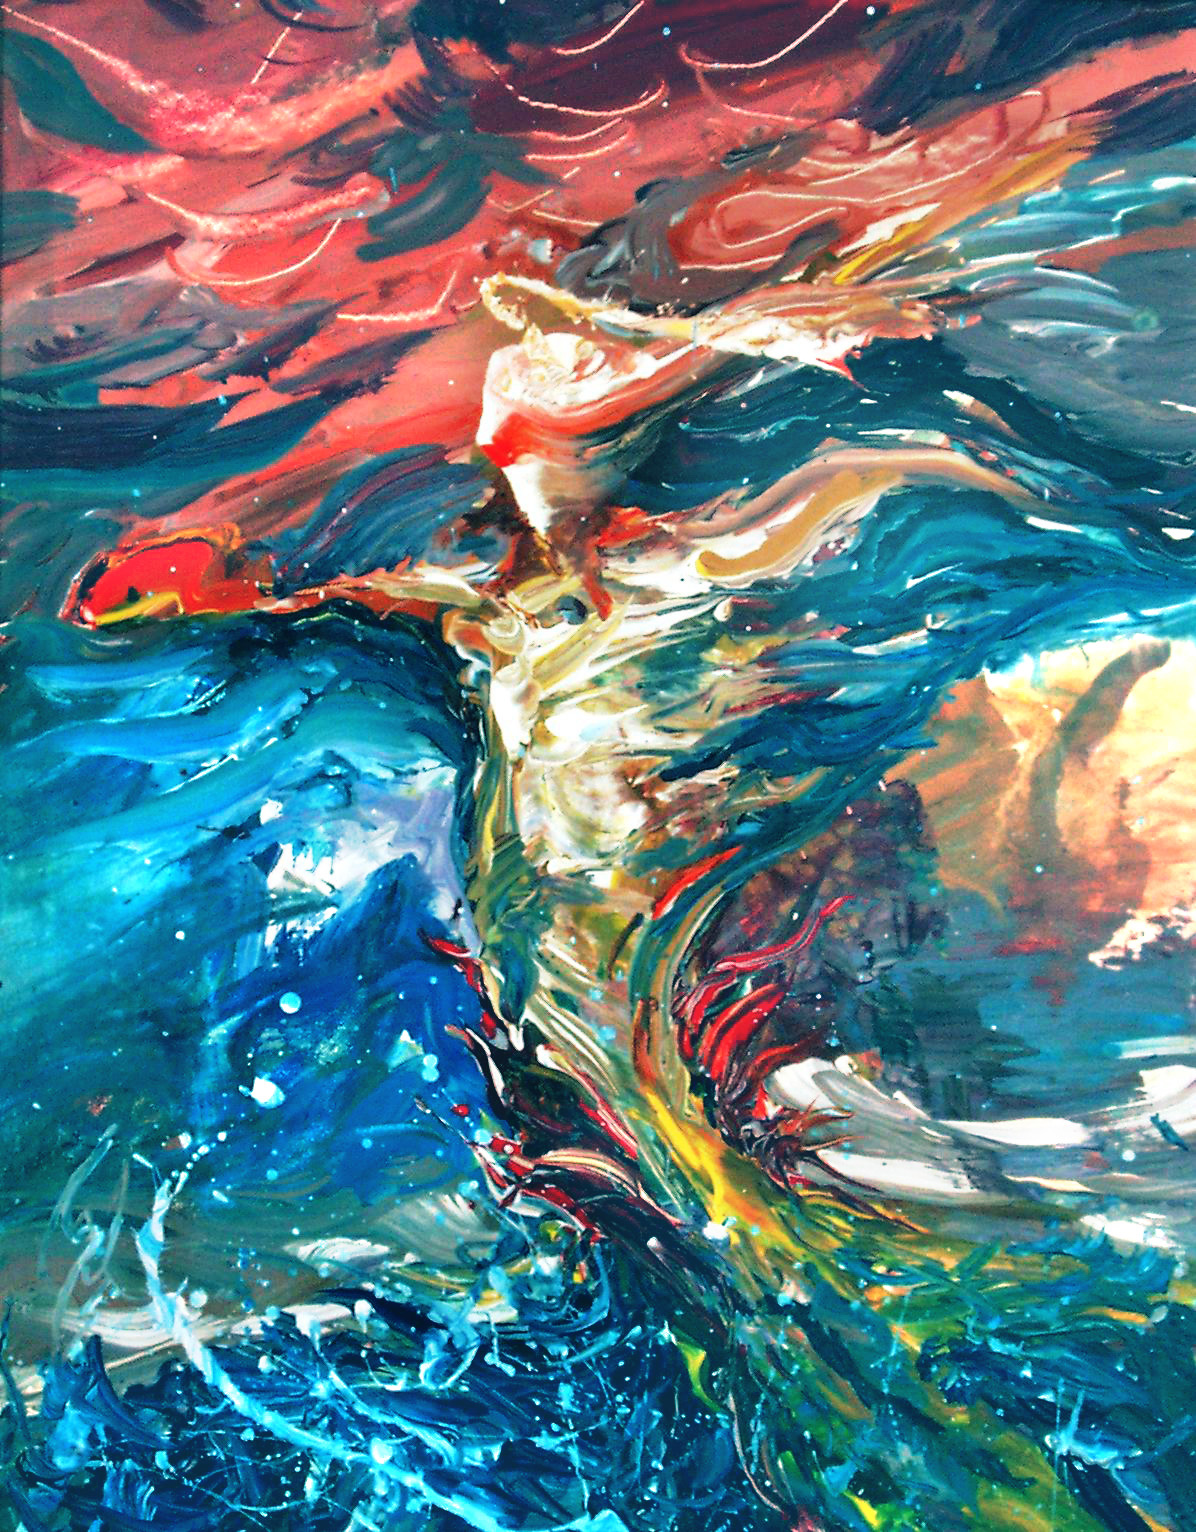 SEA GODDESS - 20 x 16, acrylic on masonite